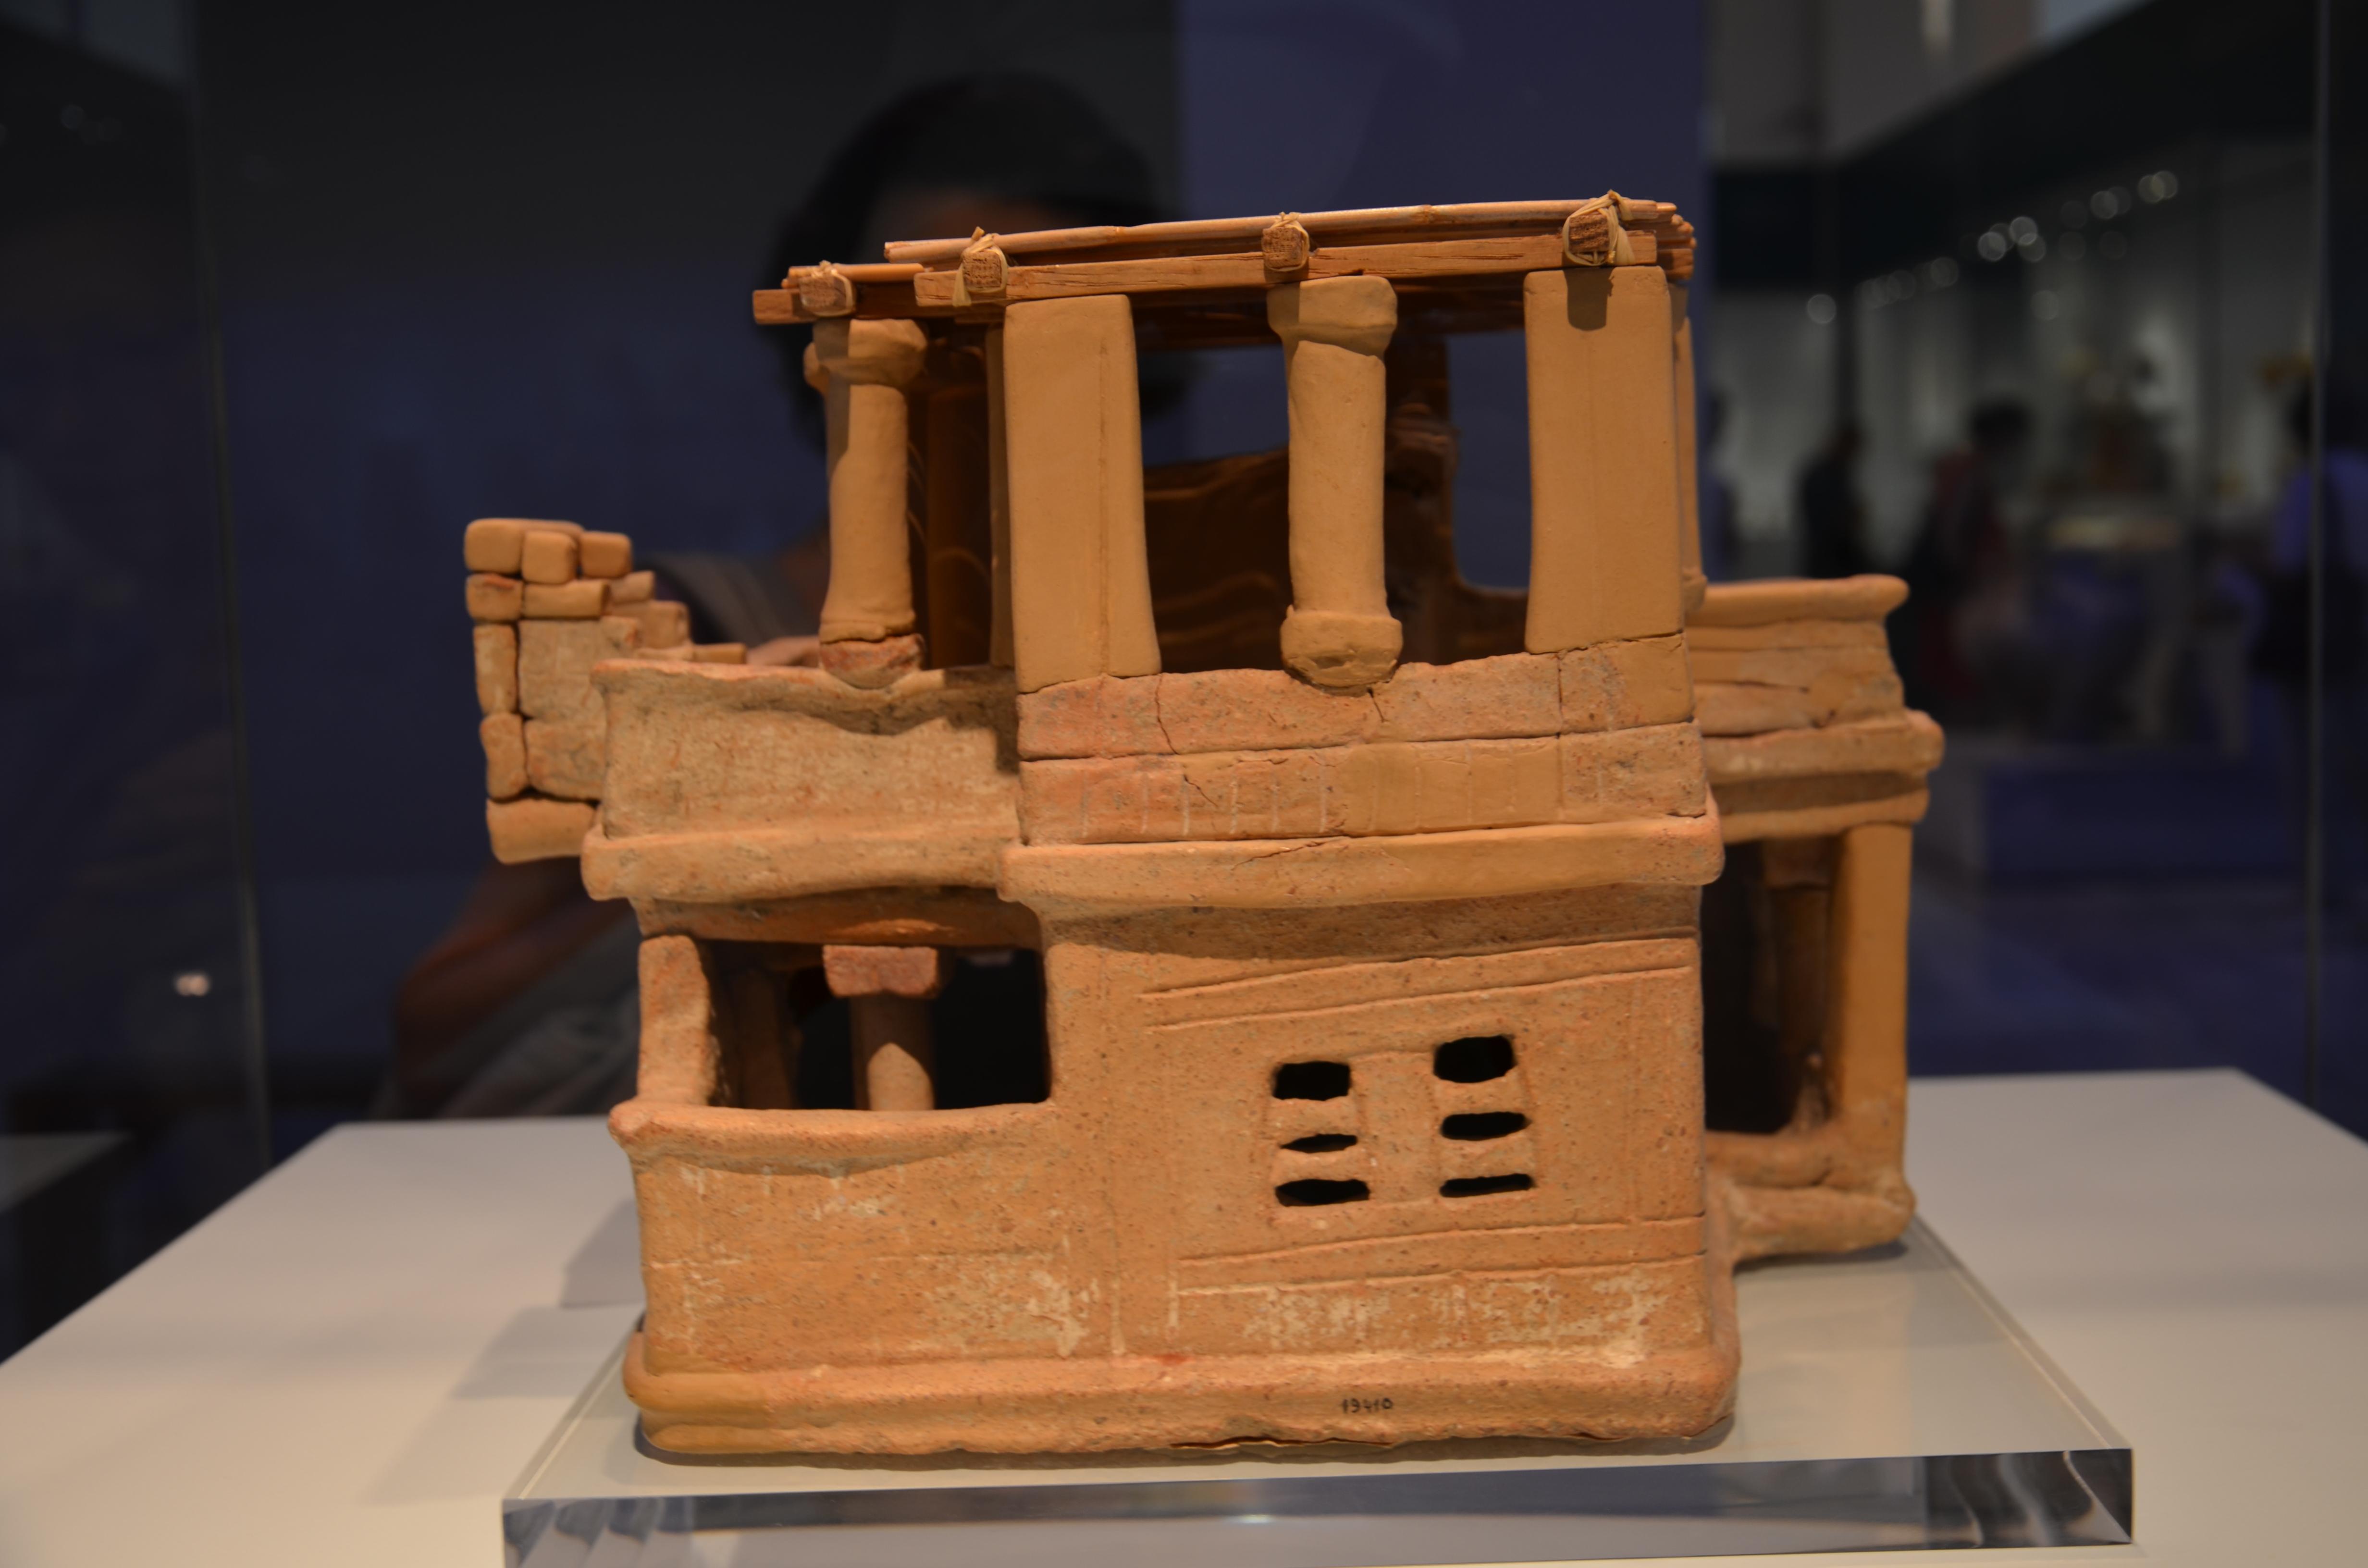 Model a house